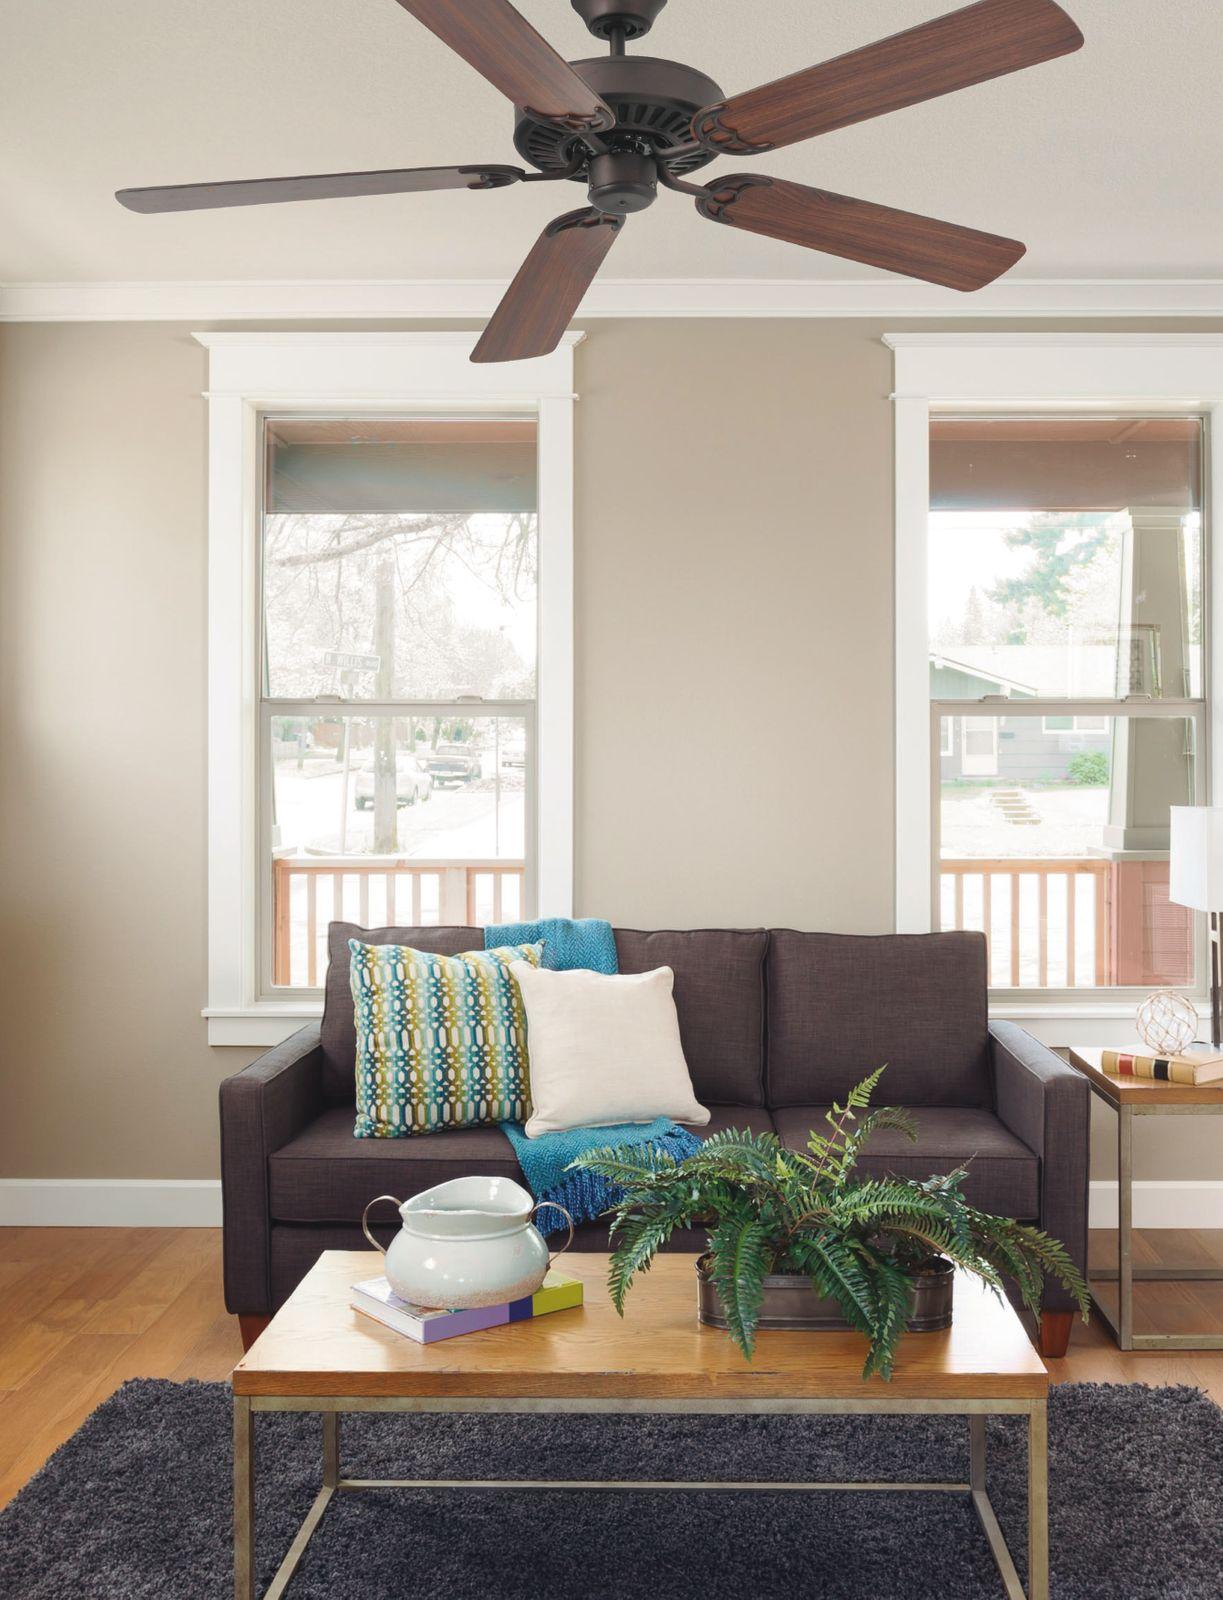 "Faro ceiling fan Aloha dark brown 132 cm 52"" with remote control"